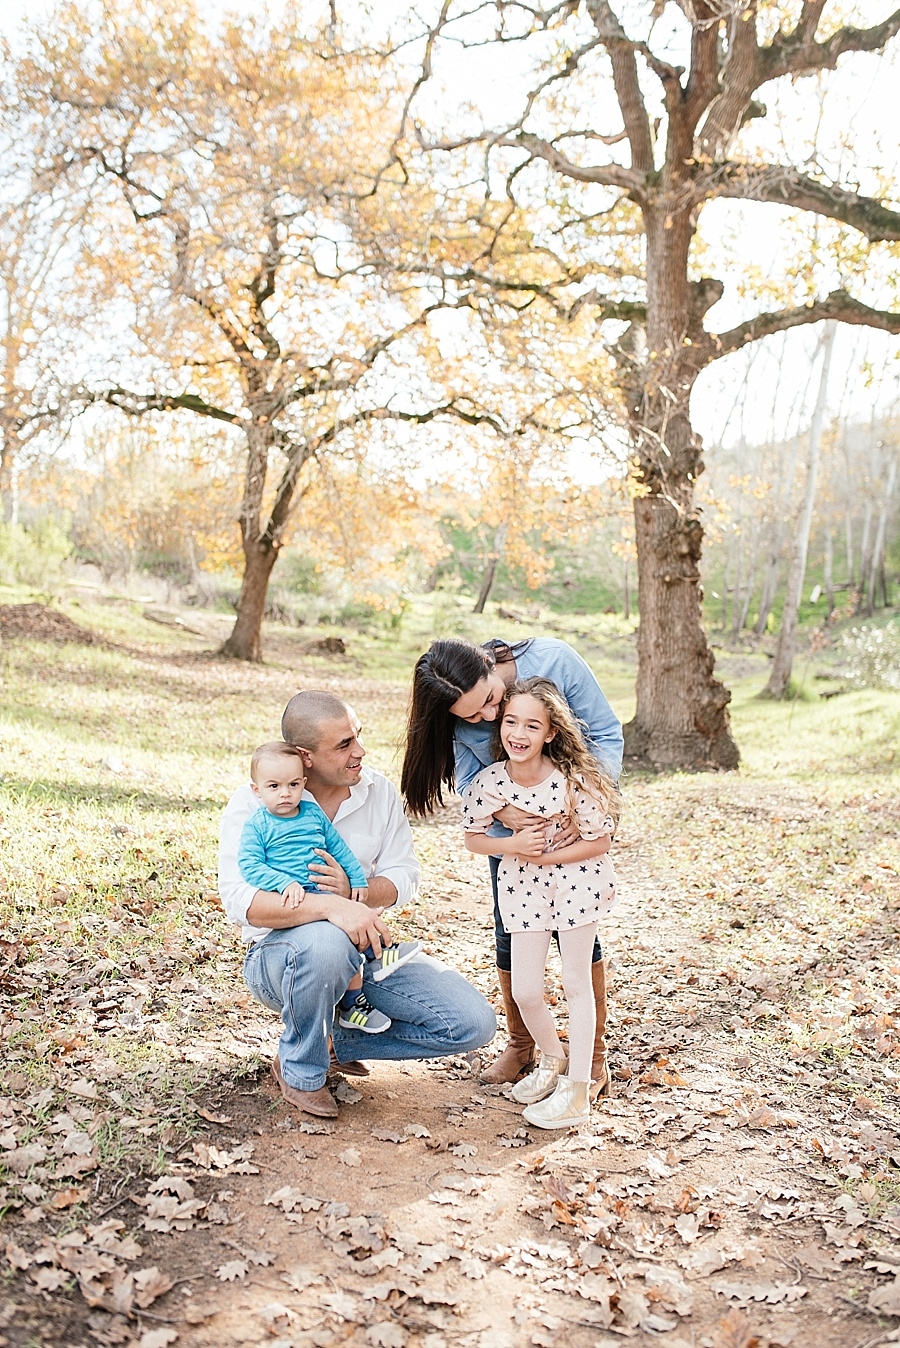 Cape Town Photographer - Family Shoot - Abrahams Family_0007.jpg